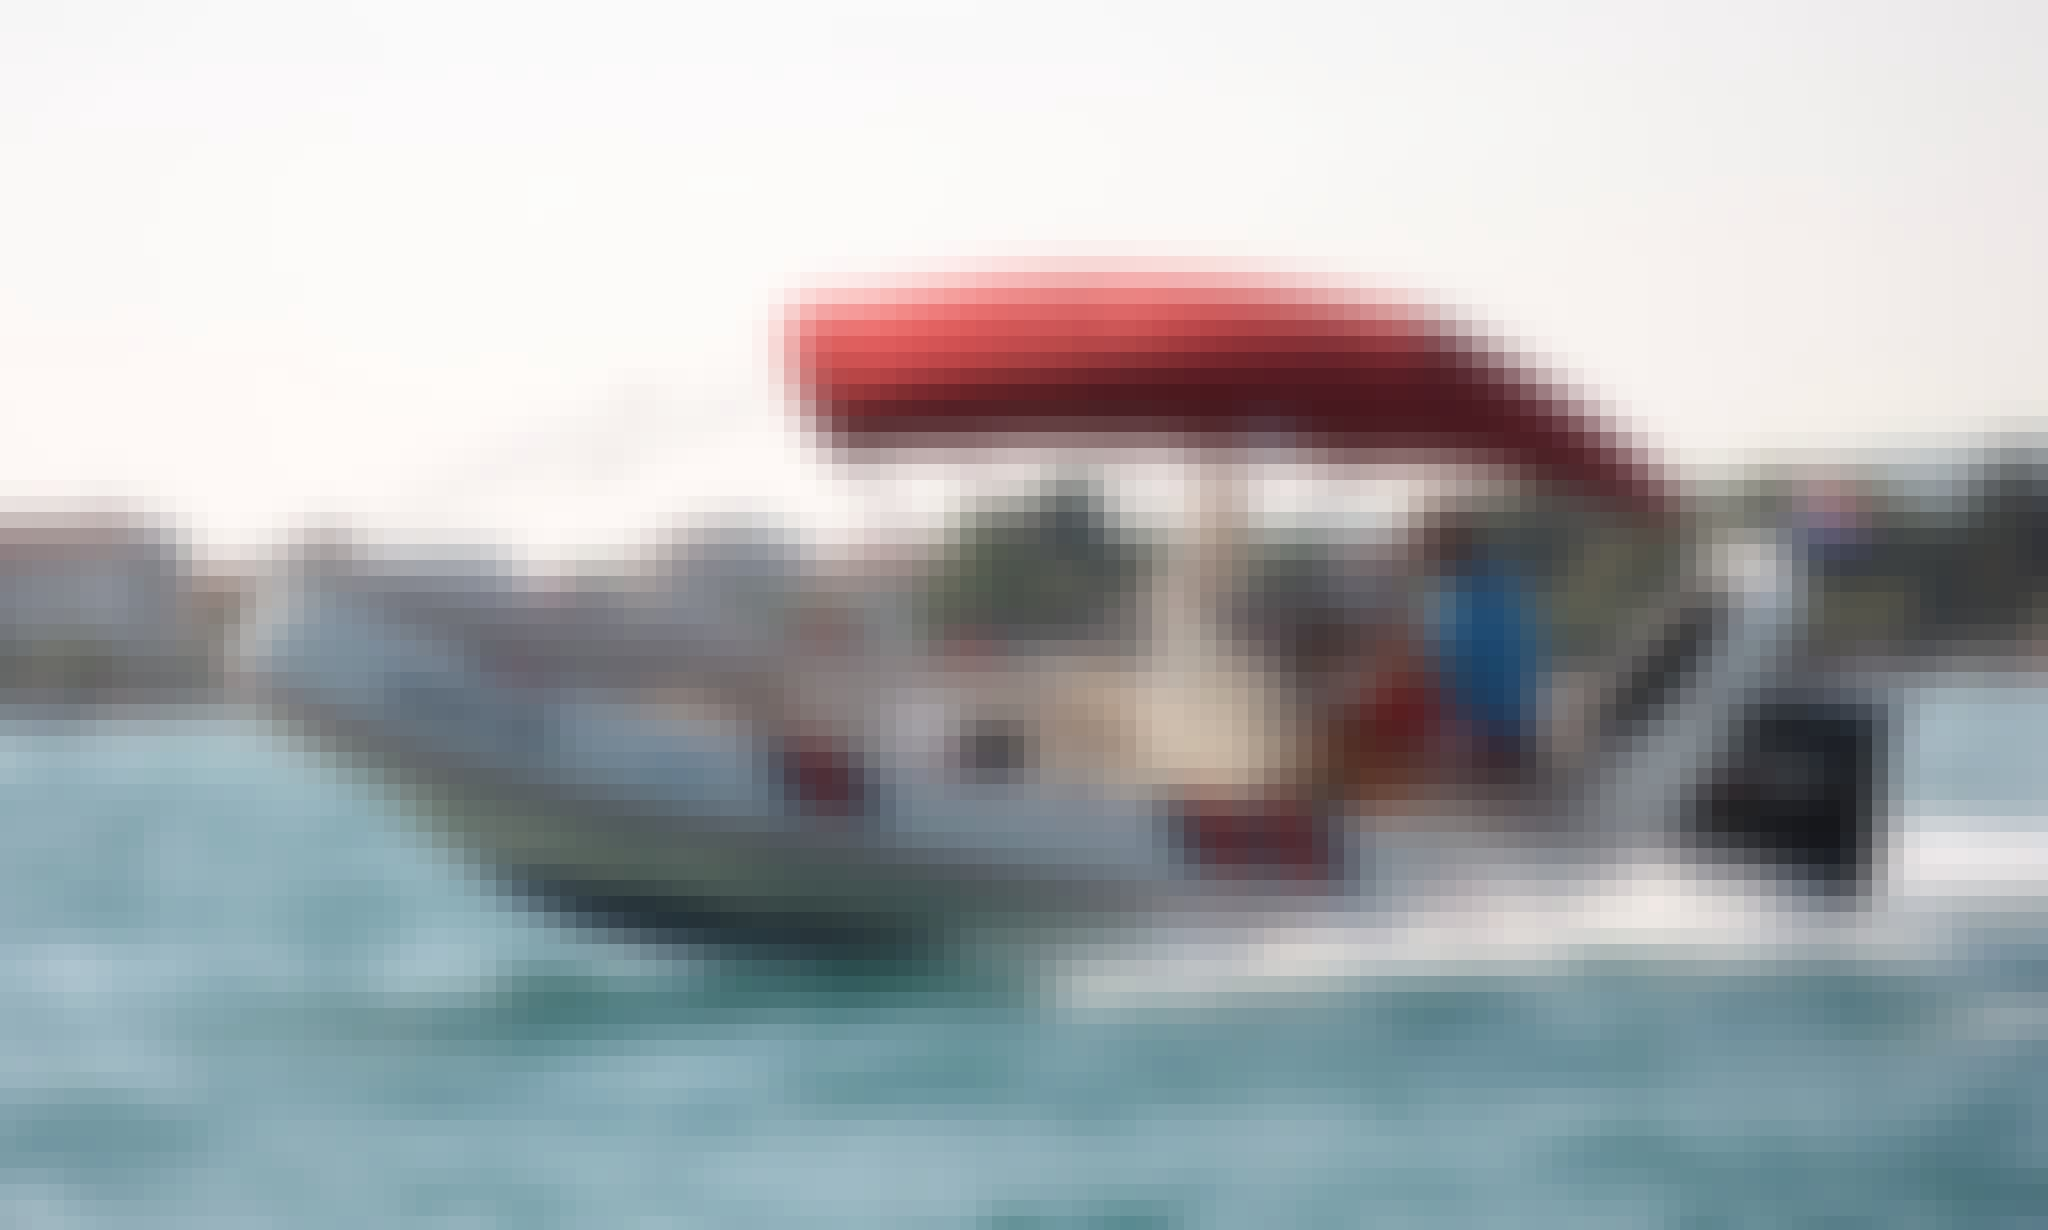 Barracuda 530 Inflatable Boat for 8 in Sukosan, Zadar